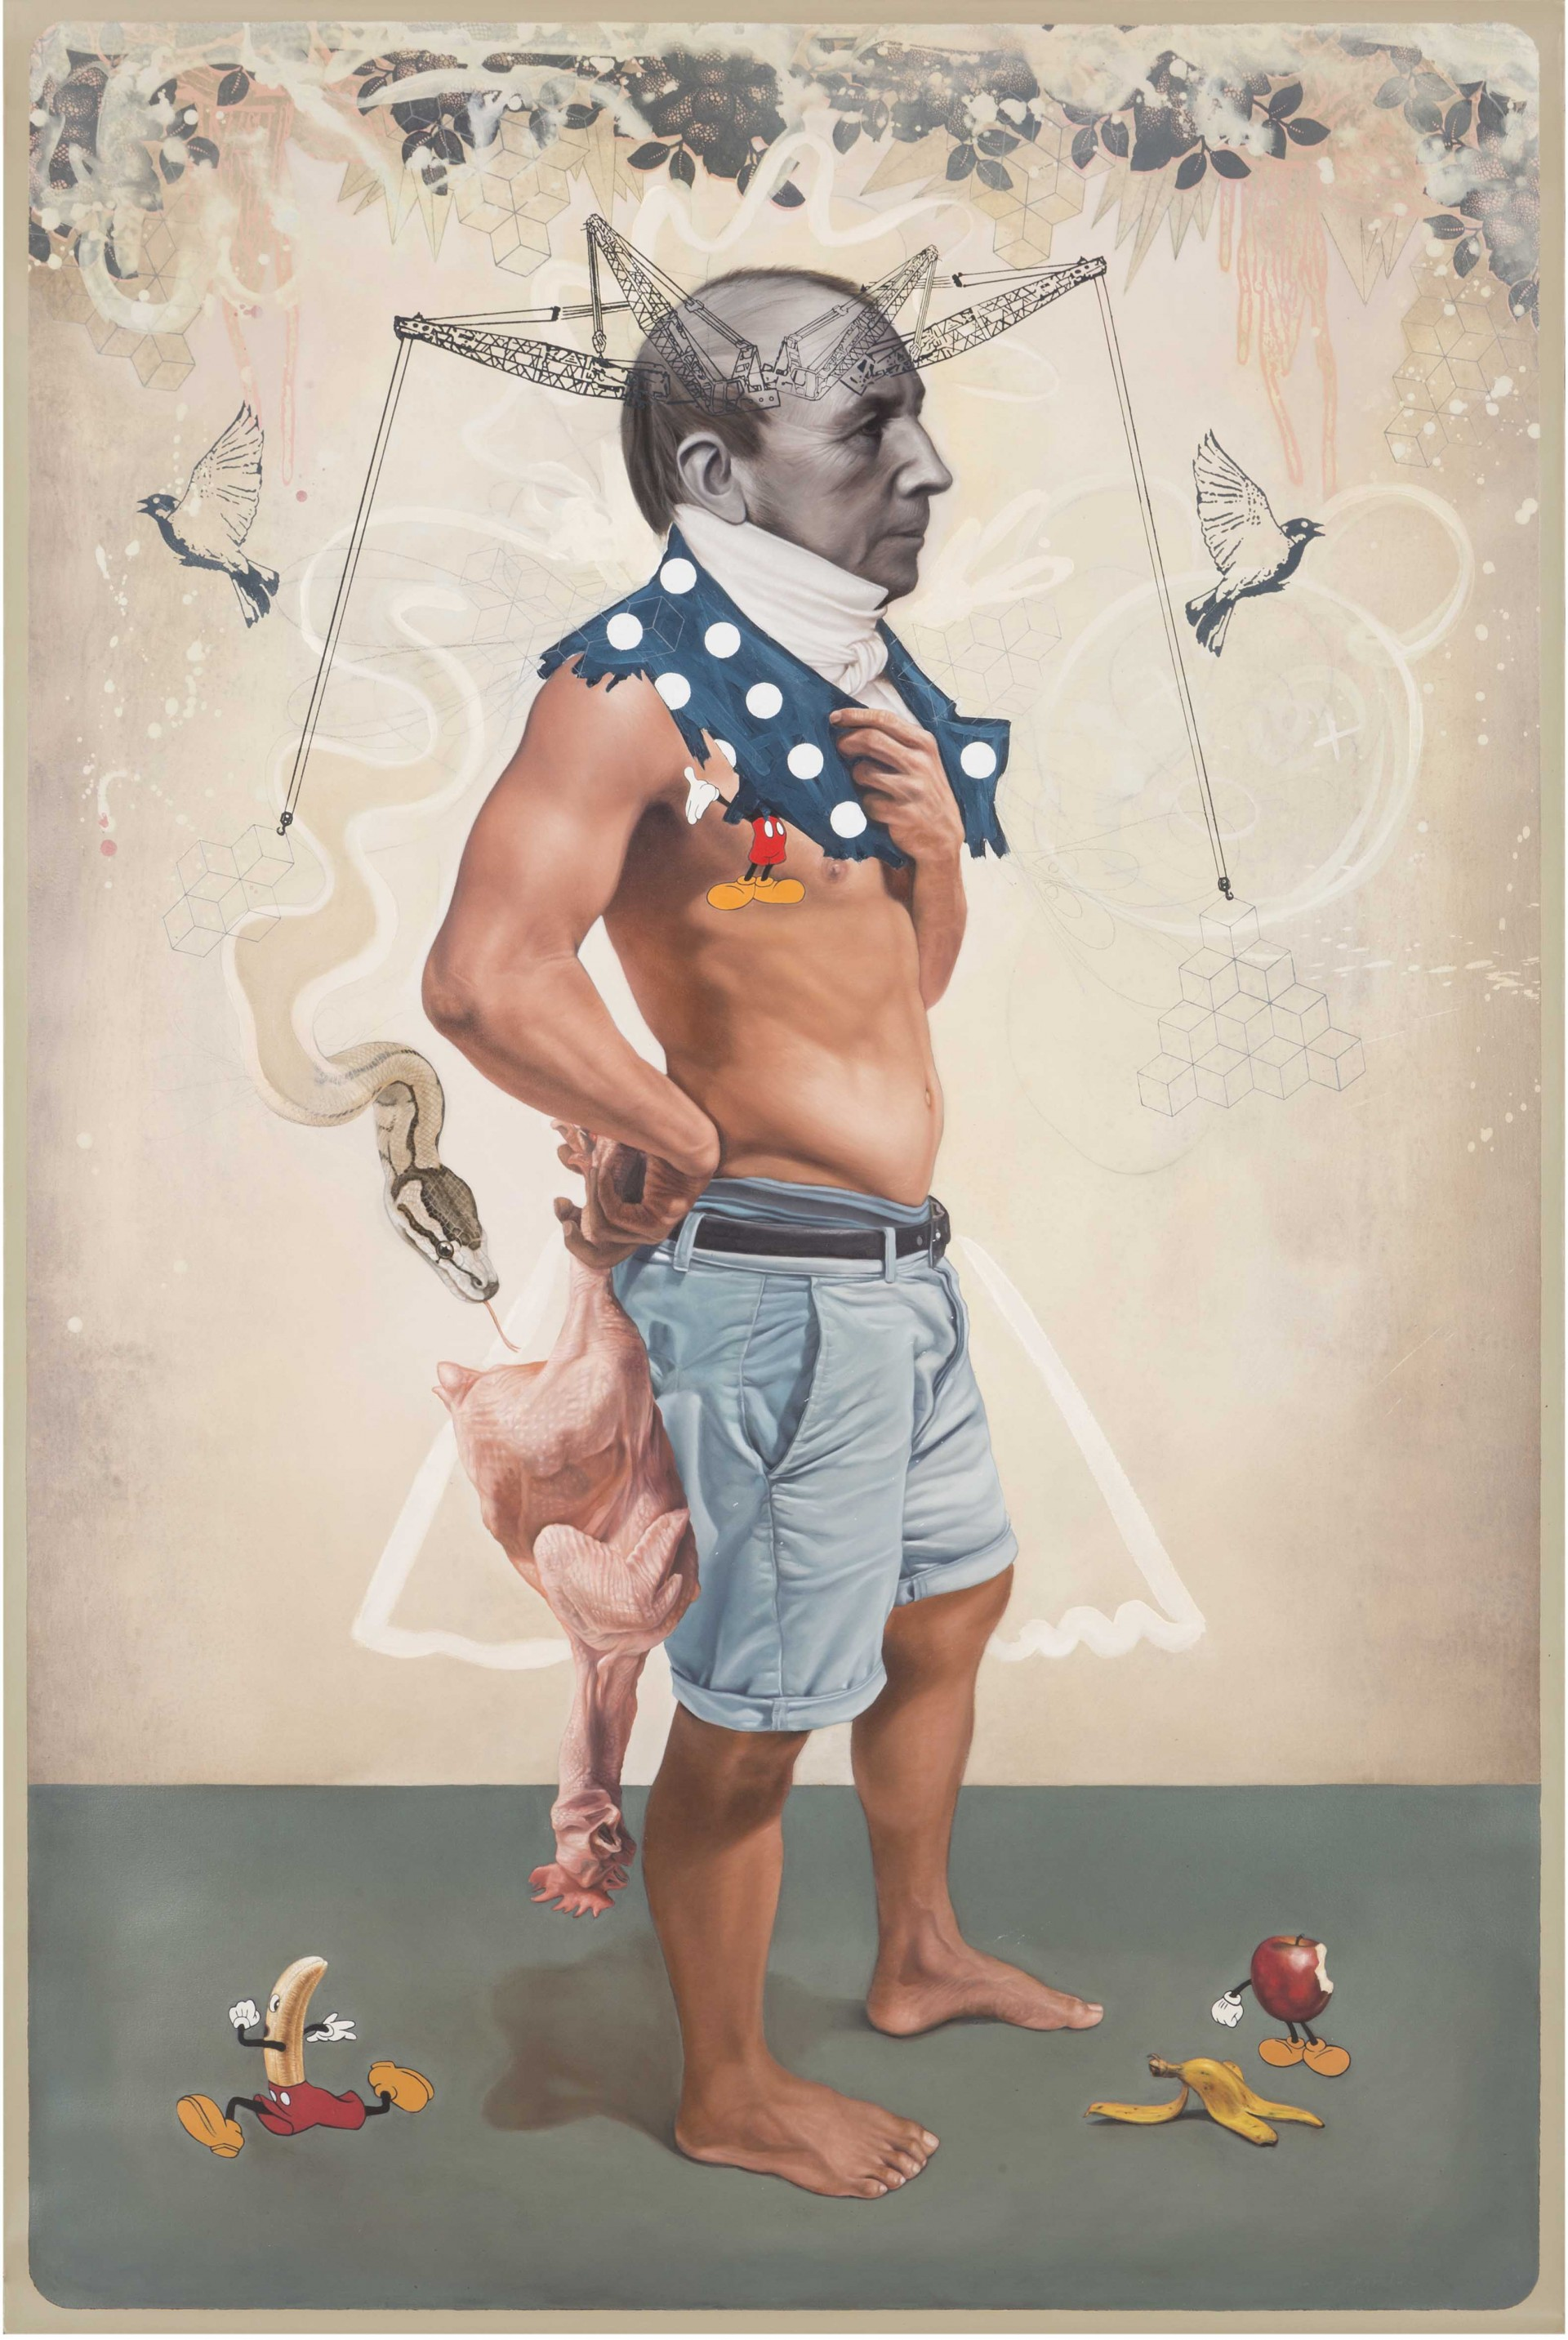 Pintô | Your Door to Philippine Contemporary Art Adam